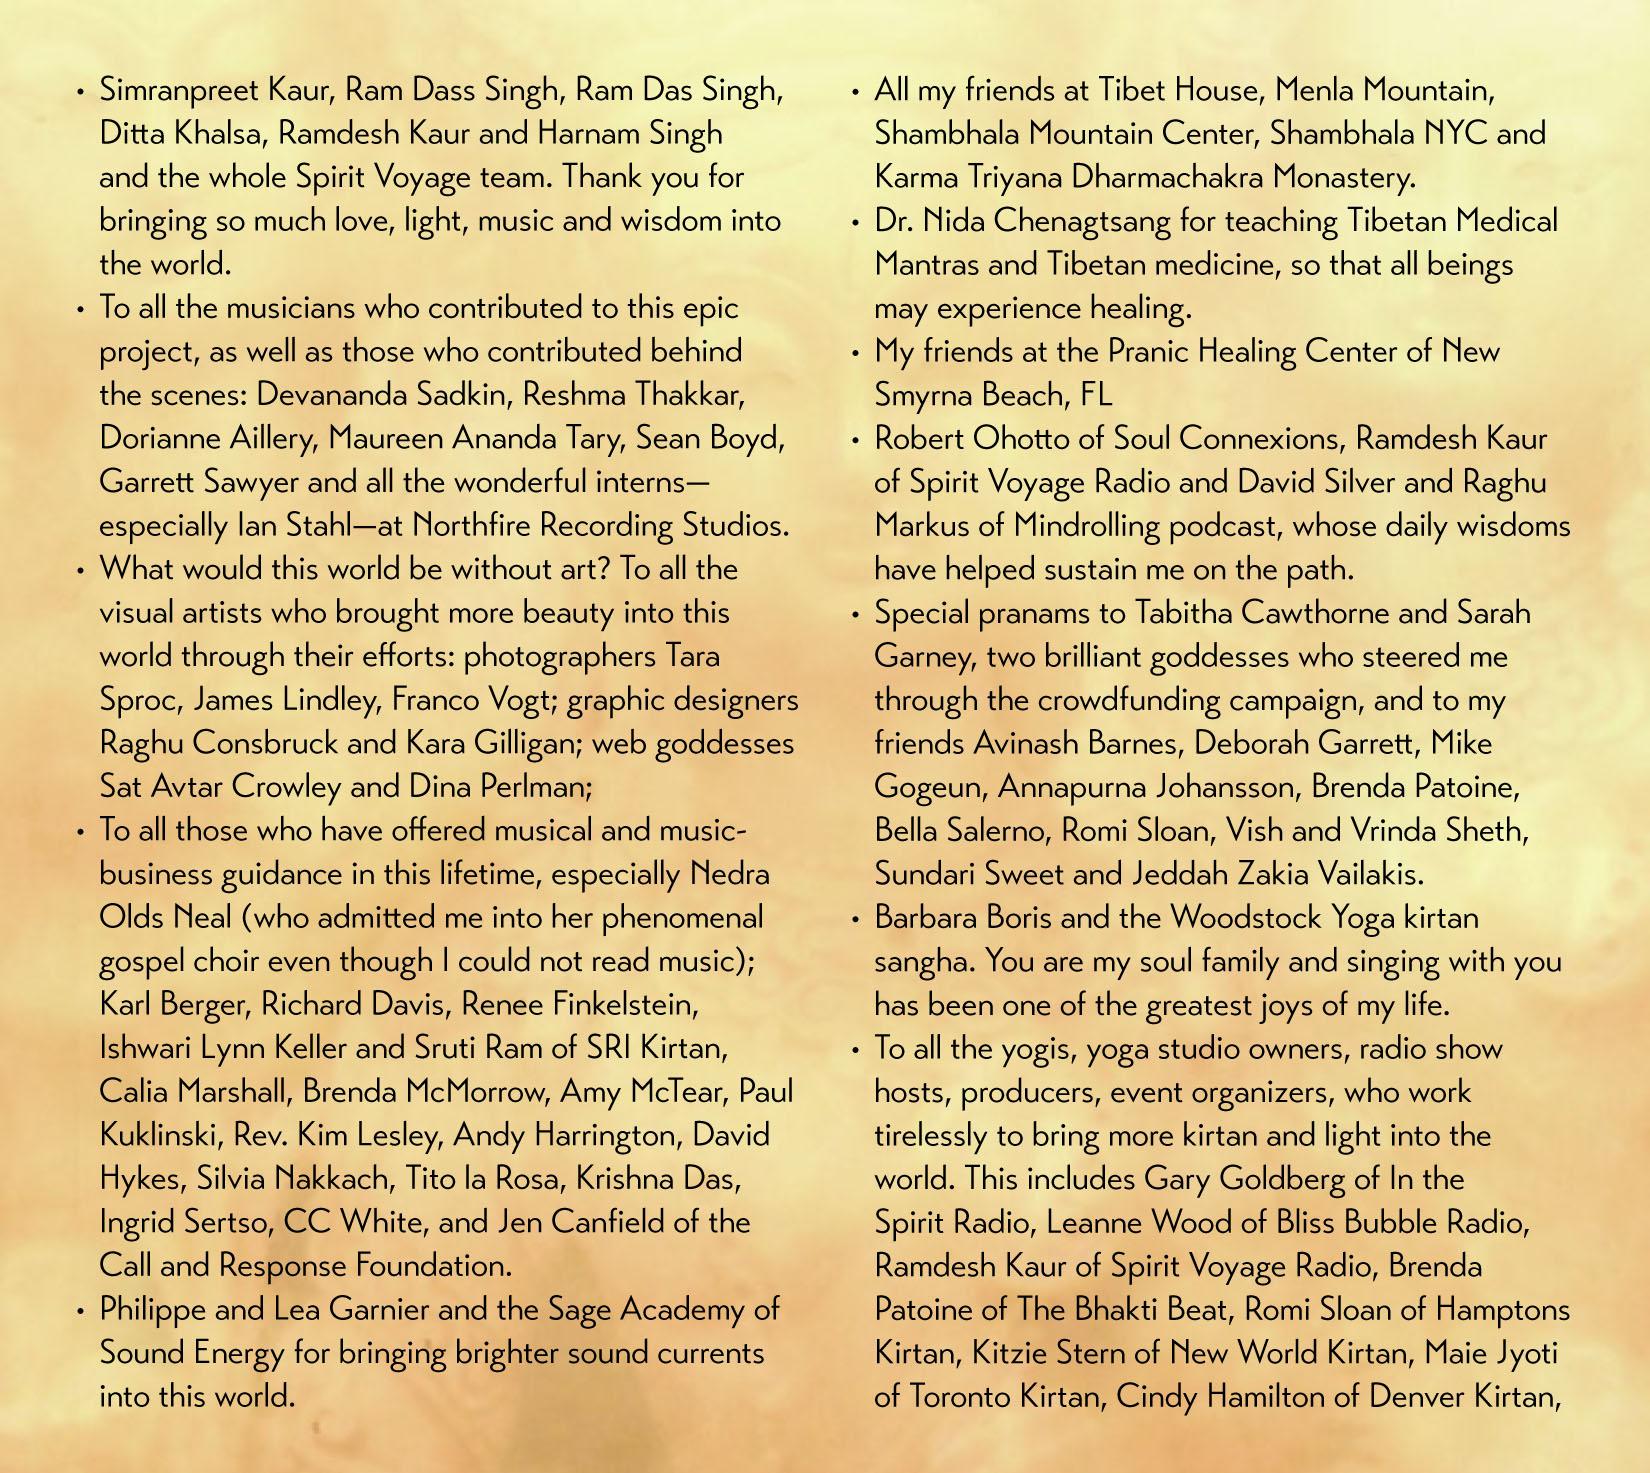 BeyondTheBeyond_AMantraMusicExDigitalBooklet_IGG_rev08-28-16 19